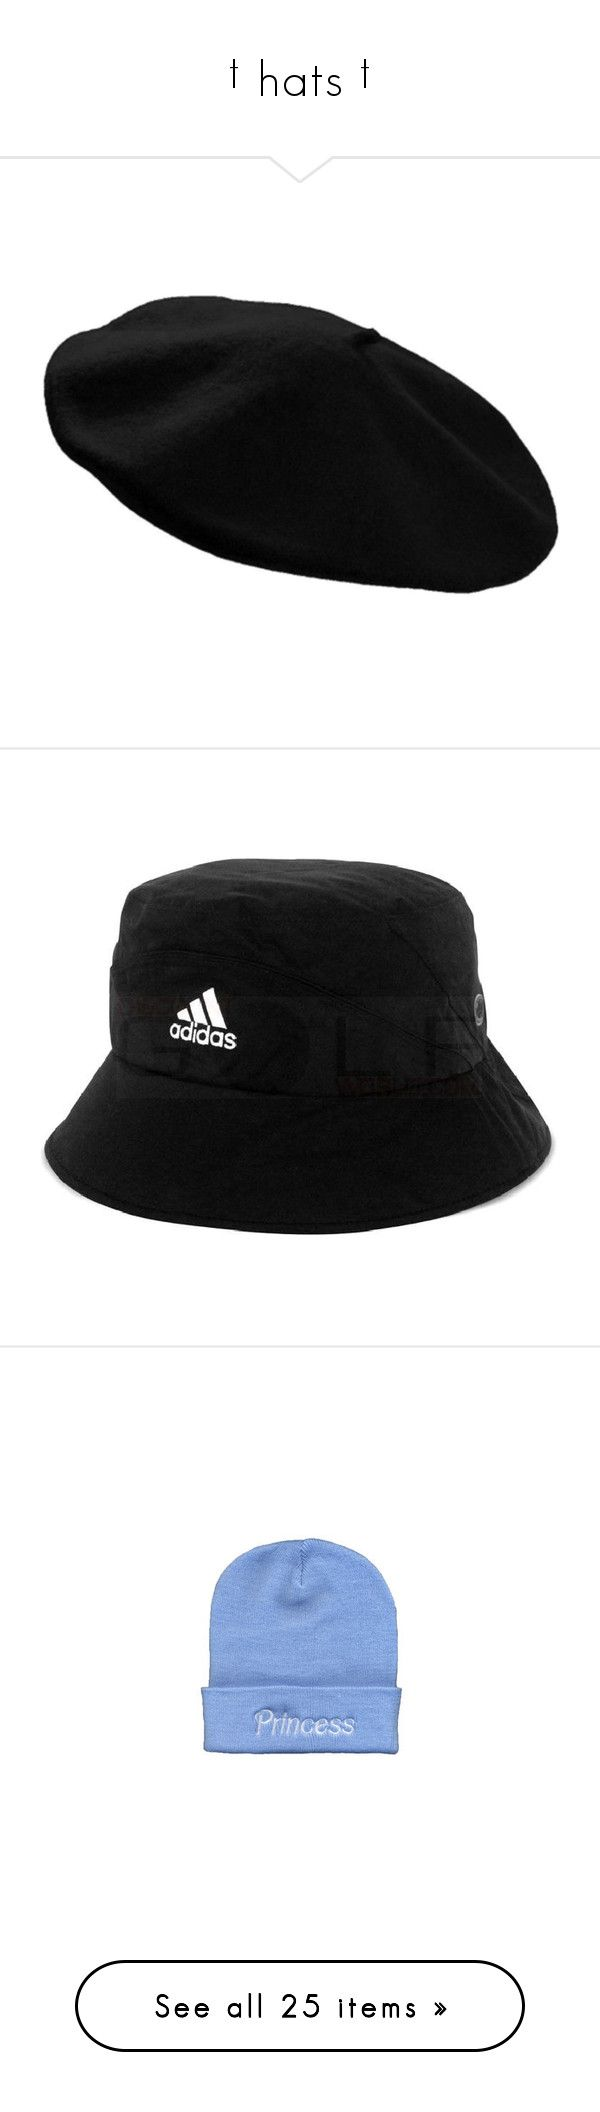 """† hats †"" by ulzz-nara ❤ liked on Polyvore featuring accessories, hats, wool beret hat, wool beret, woolen hat, beret hat, wool hat, bucket hats, headwear and waterproof hat"